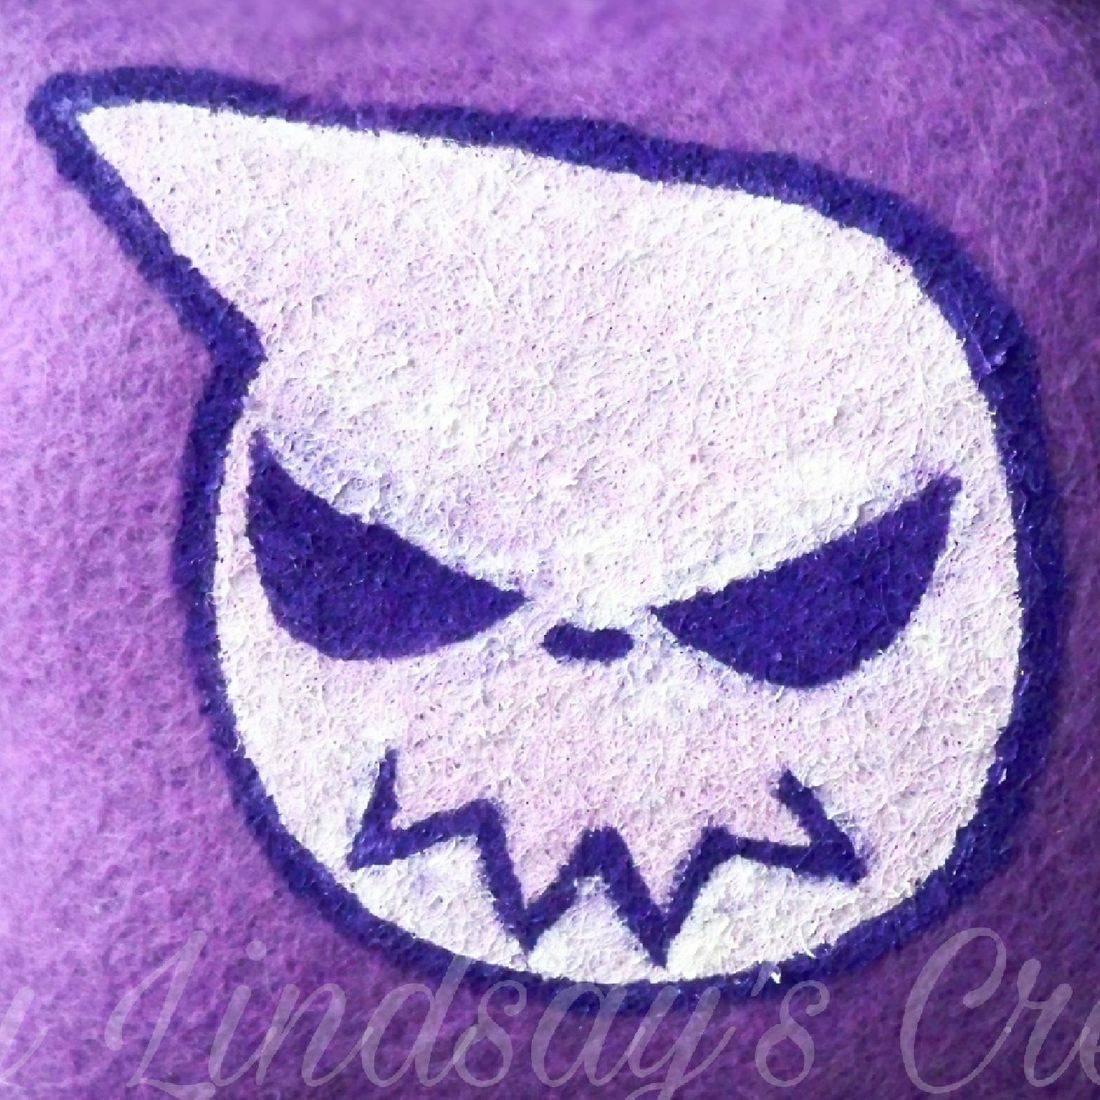 Soul Eater, purple, anime, otaku, nerd, geek, hand painted, handcrafted, craft, handmade, Etsy, shop small, small business